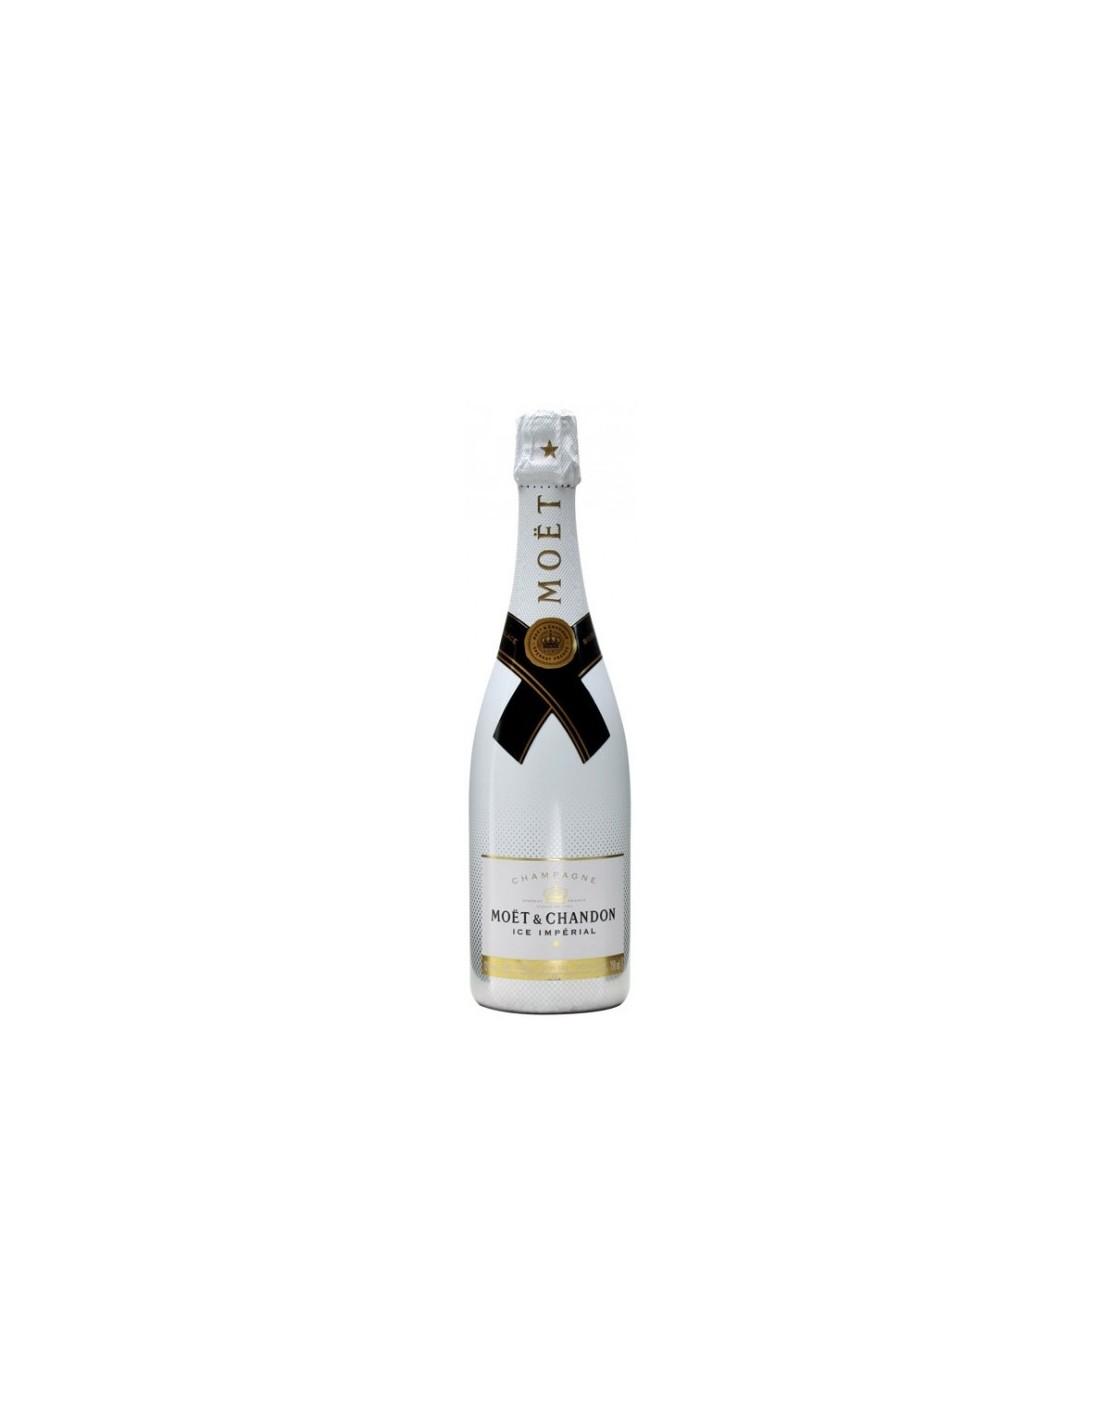 Sampanie demisec, Moët & Chandon Ice Imperial Champagne, 0.75L, 12% alc., Franta